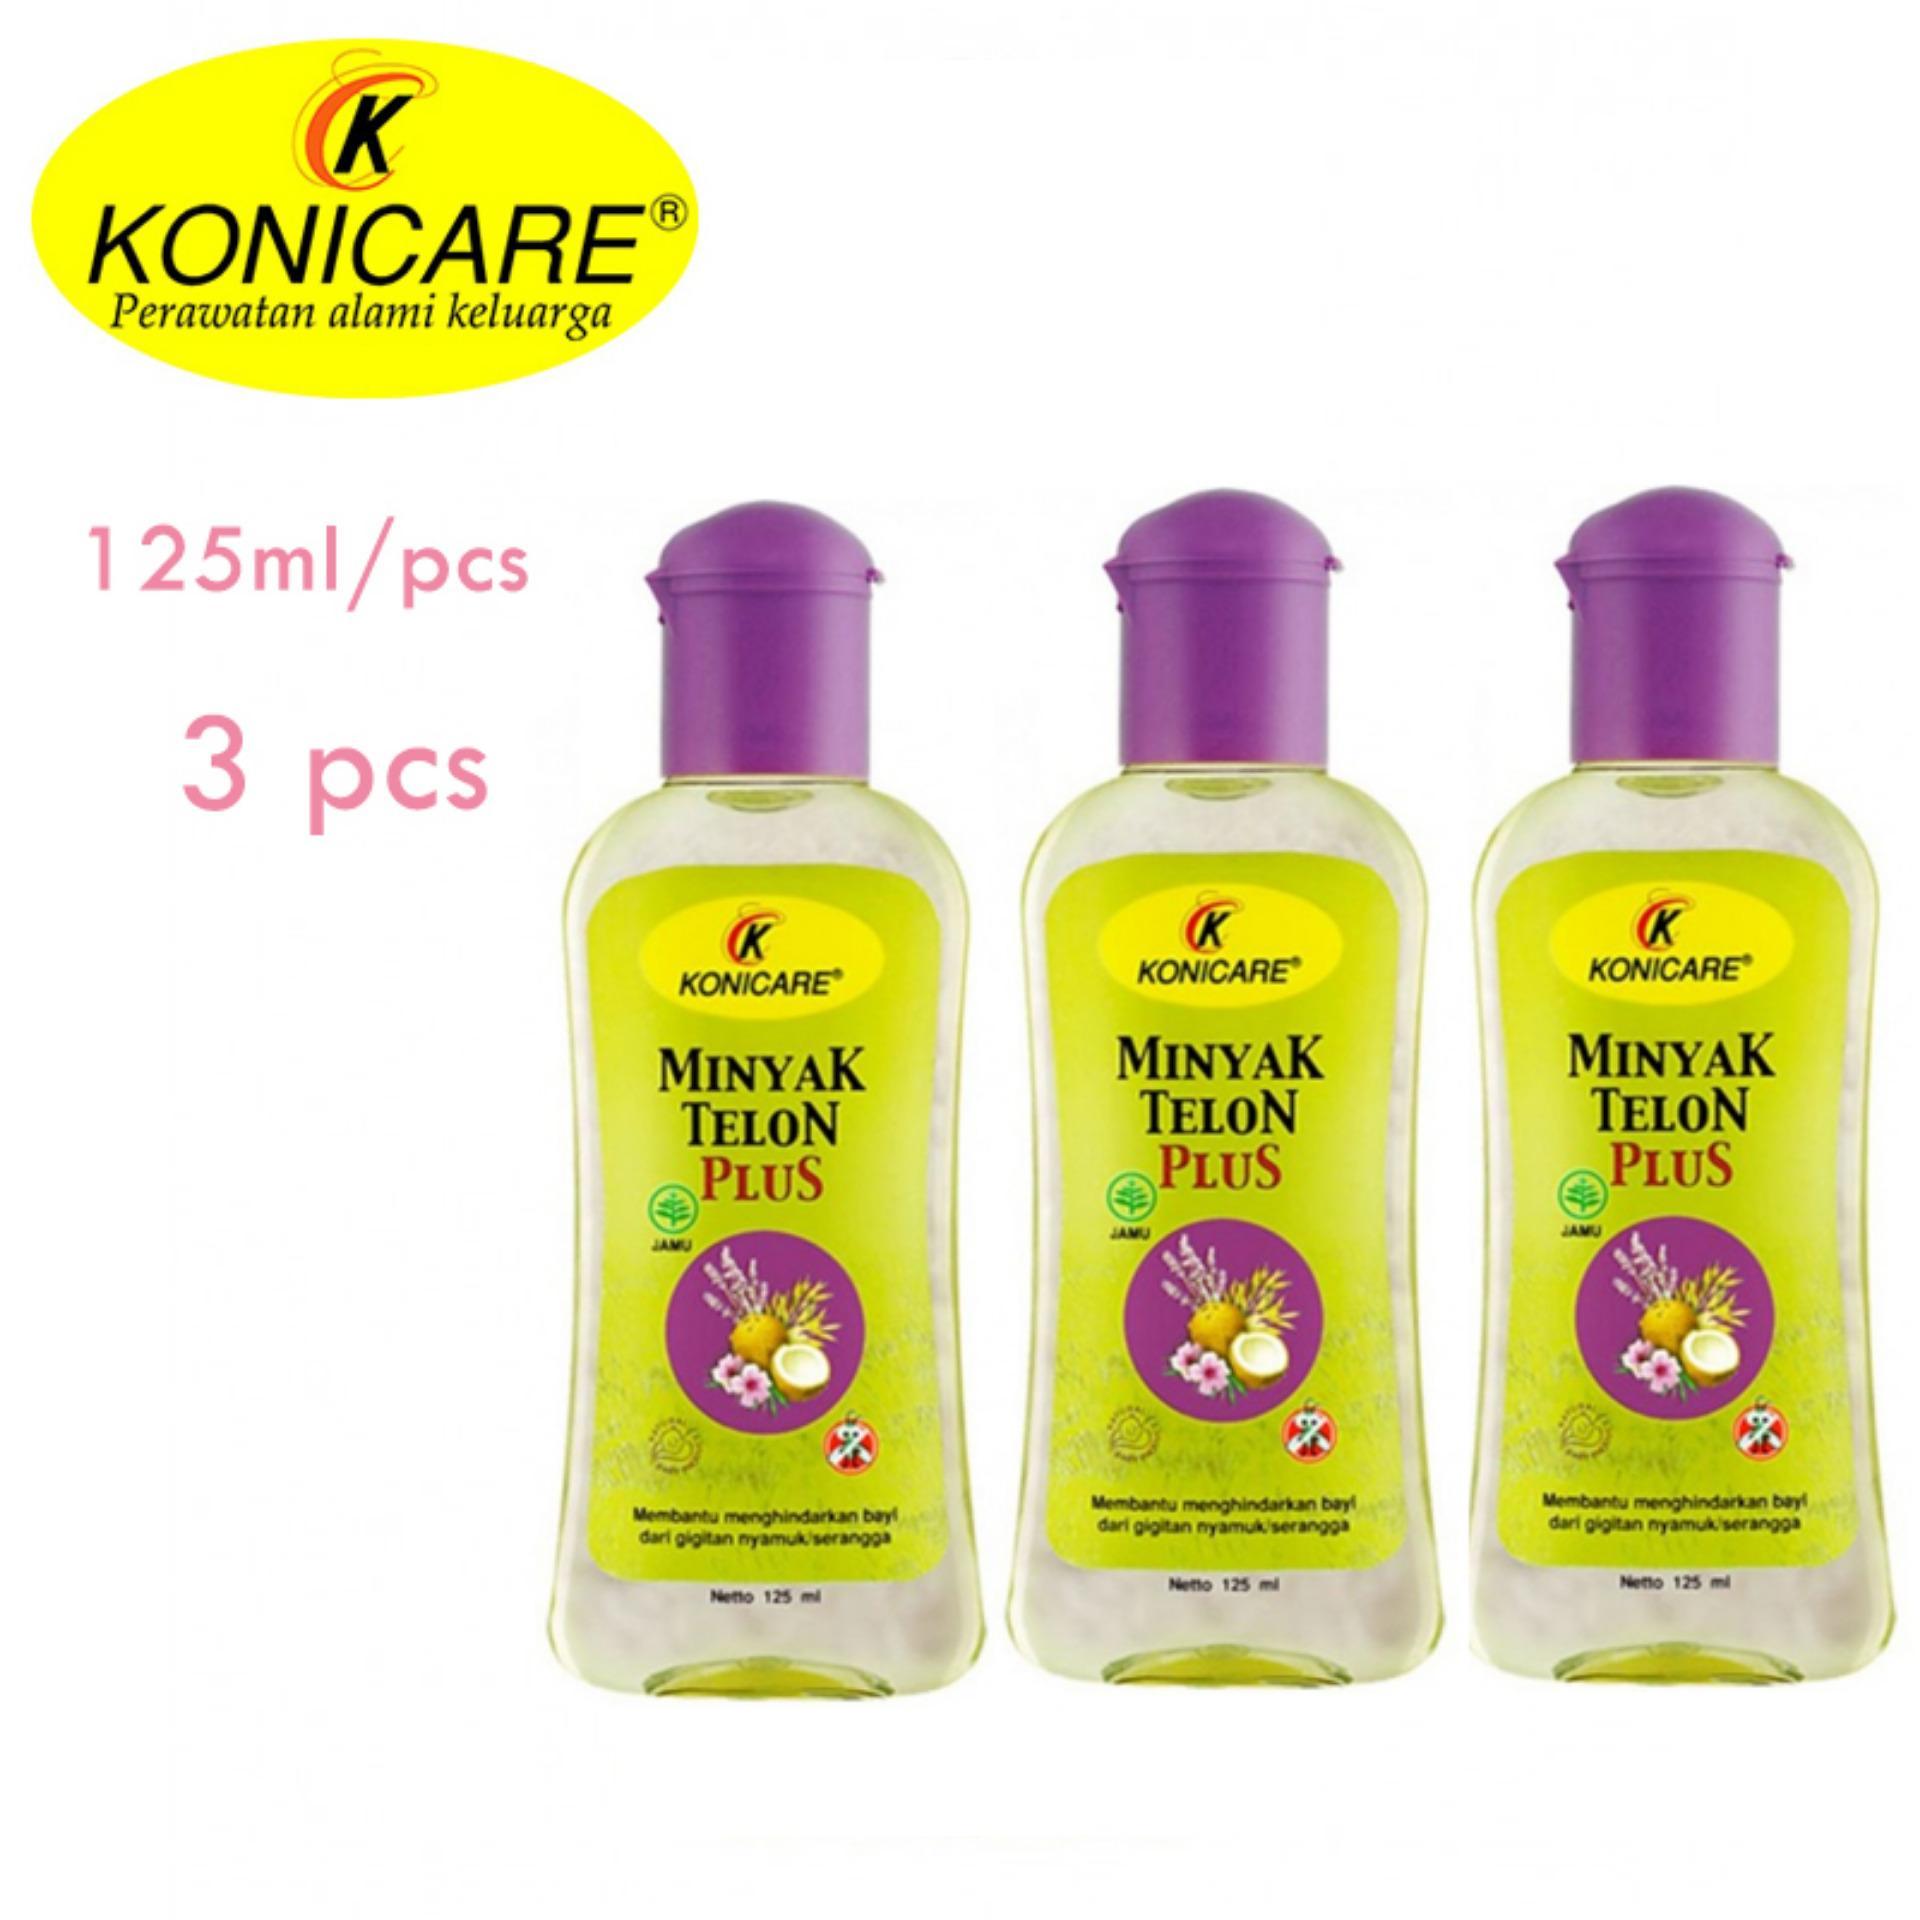 Toko Konicare Minyak Telon Plus 125 Ml 3 Pcs Terlengkap